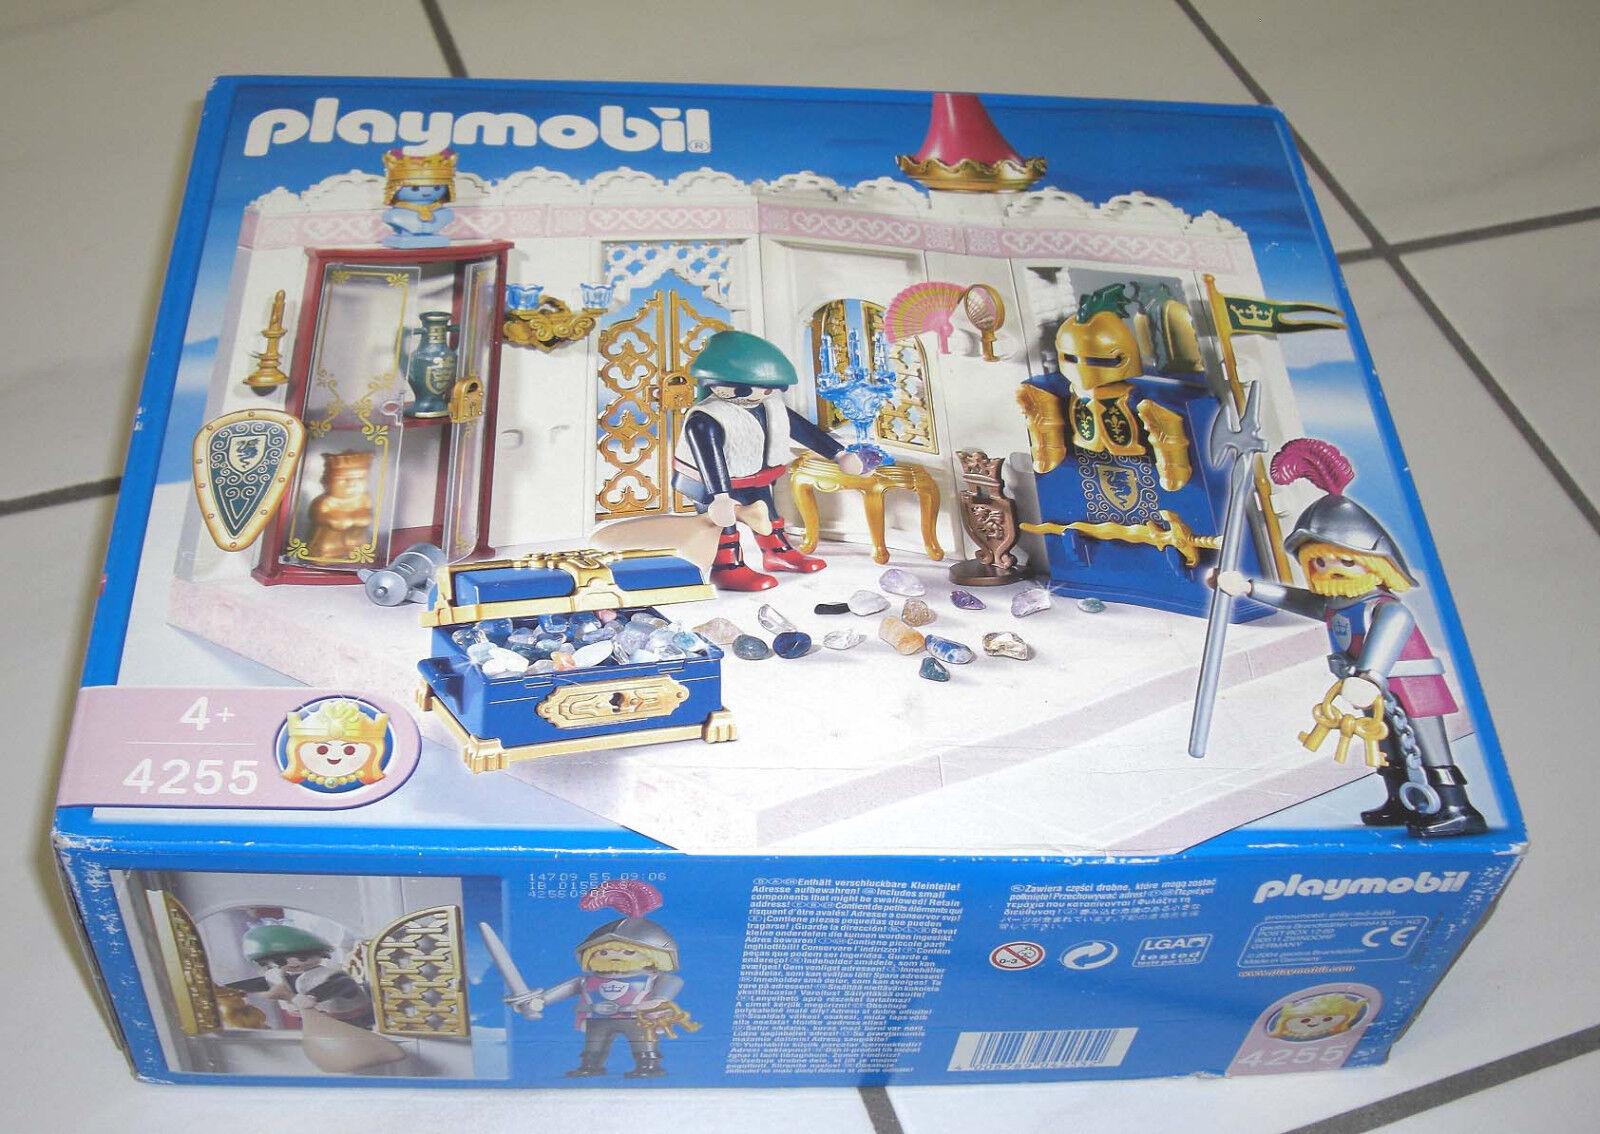 Playmobil Schatzkammer Waffenkammer 4255 Anbau Schloß 4250 NEU OVP ungeöffnet